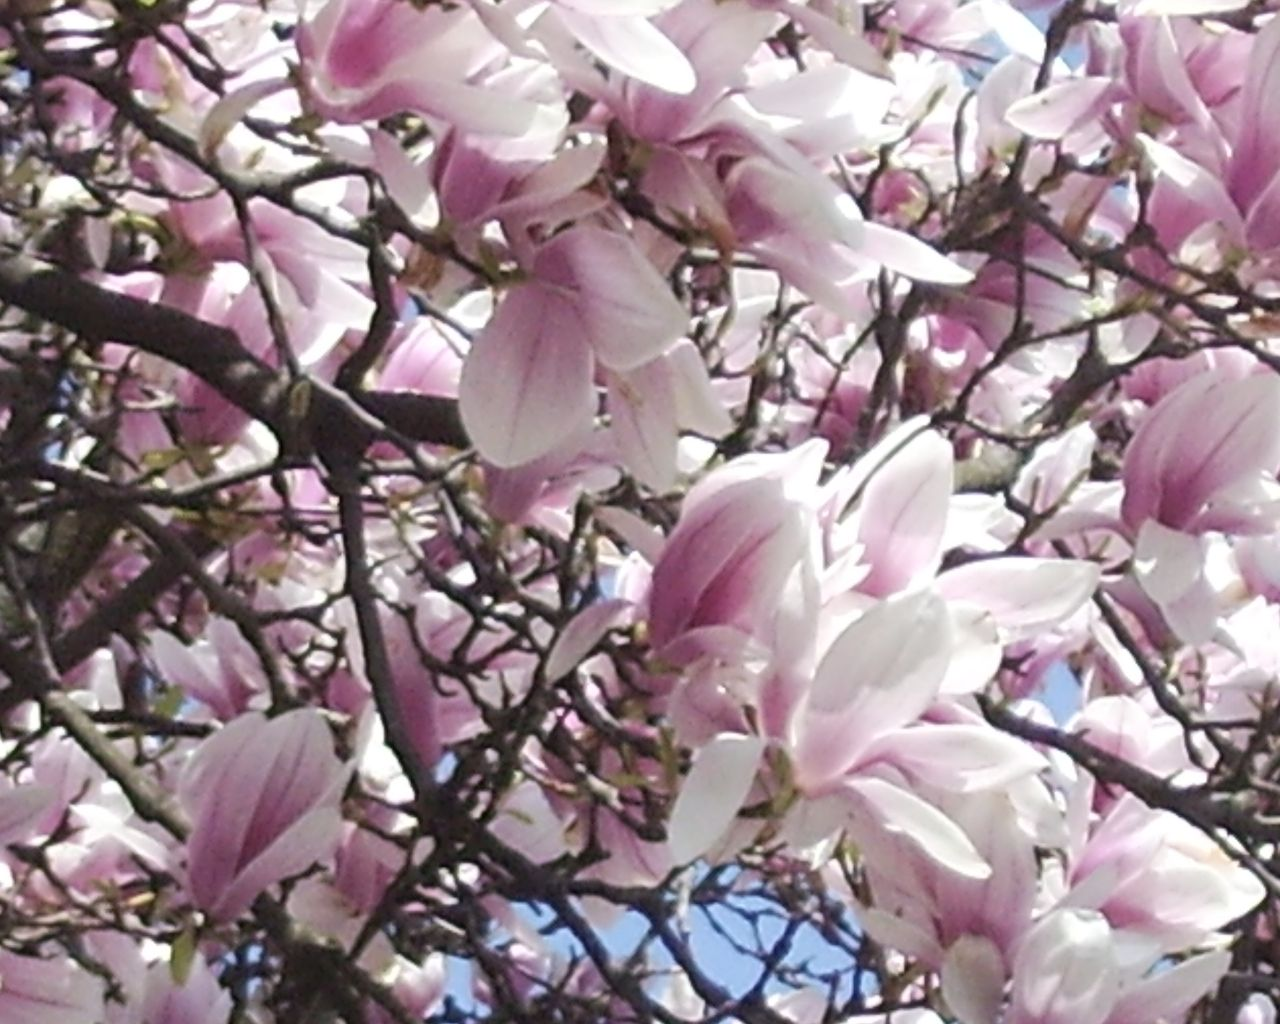 Magnolienblueten